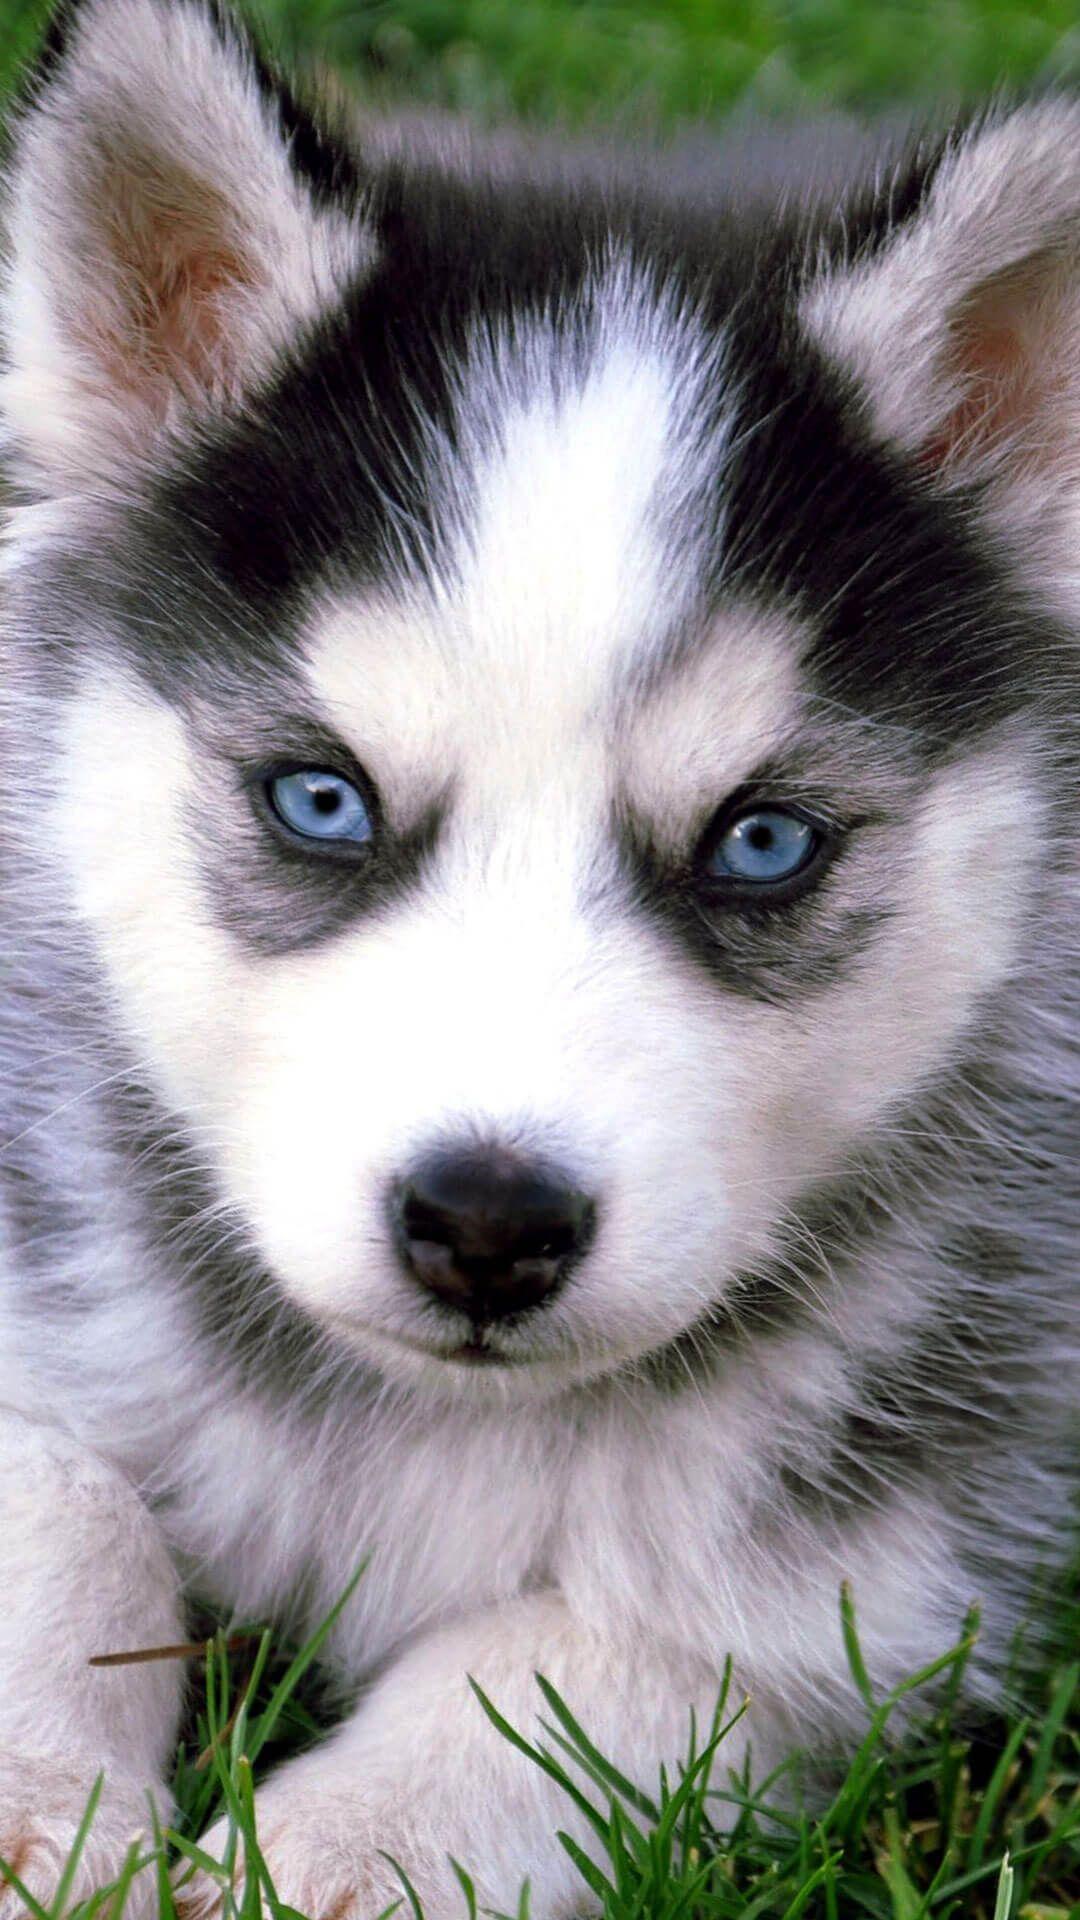 Husky Puppies Wallpapers Top Free Husky Puppies Backgrounds Wallpaperaccess